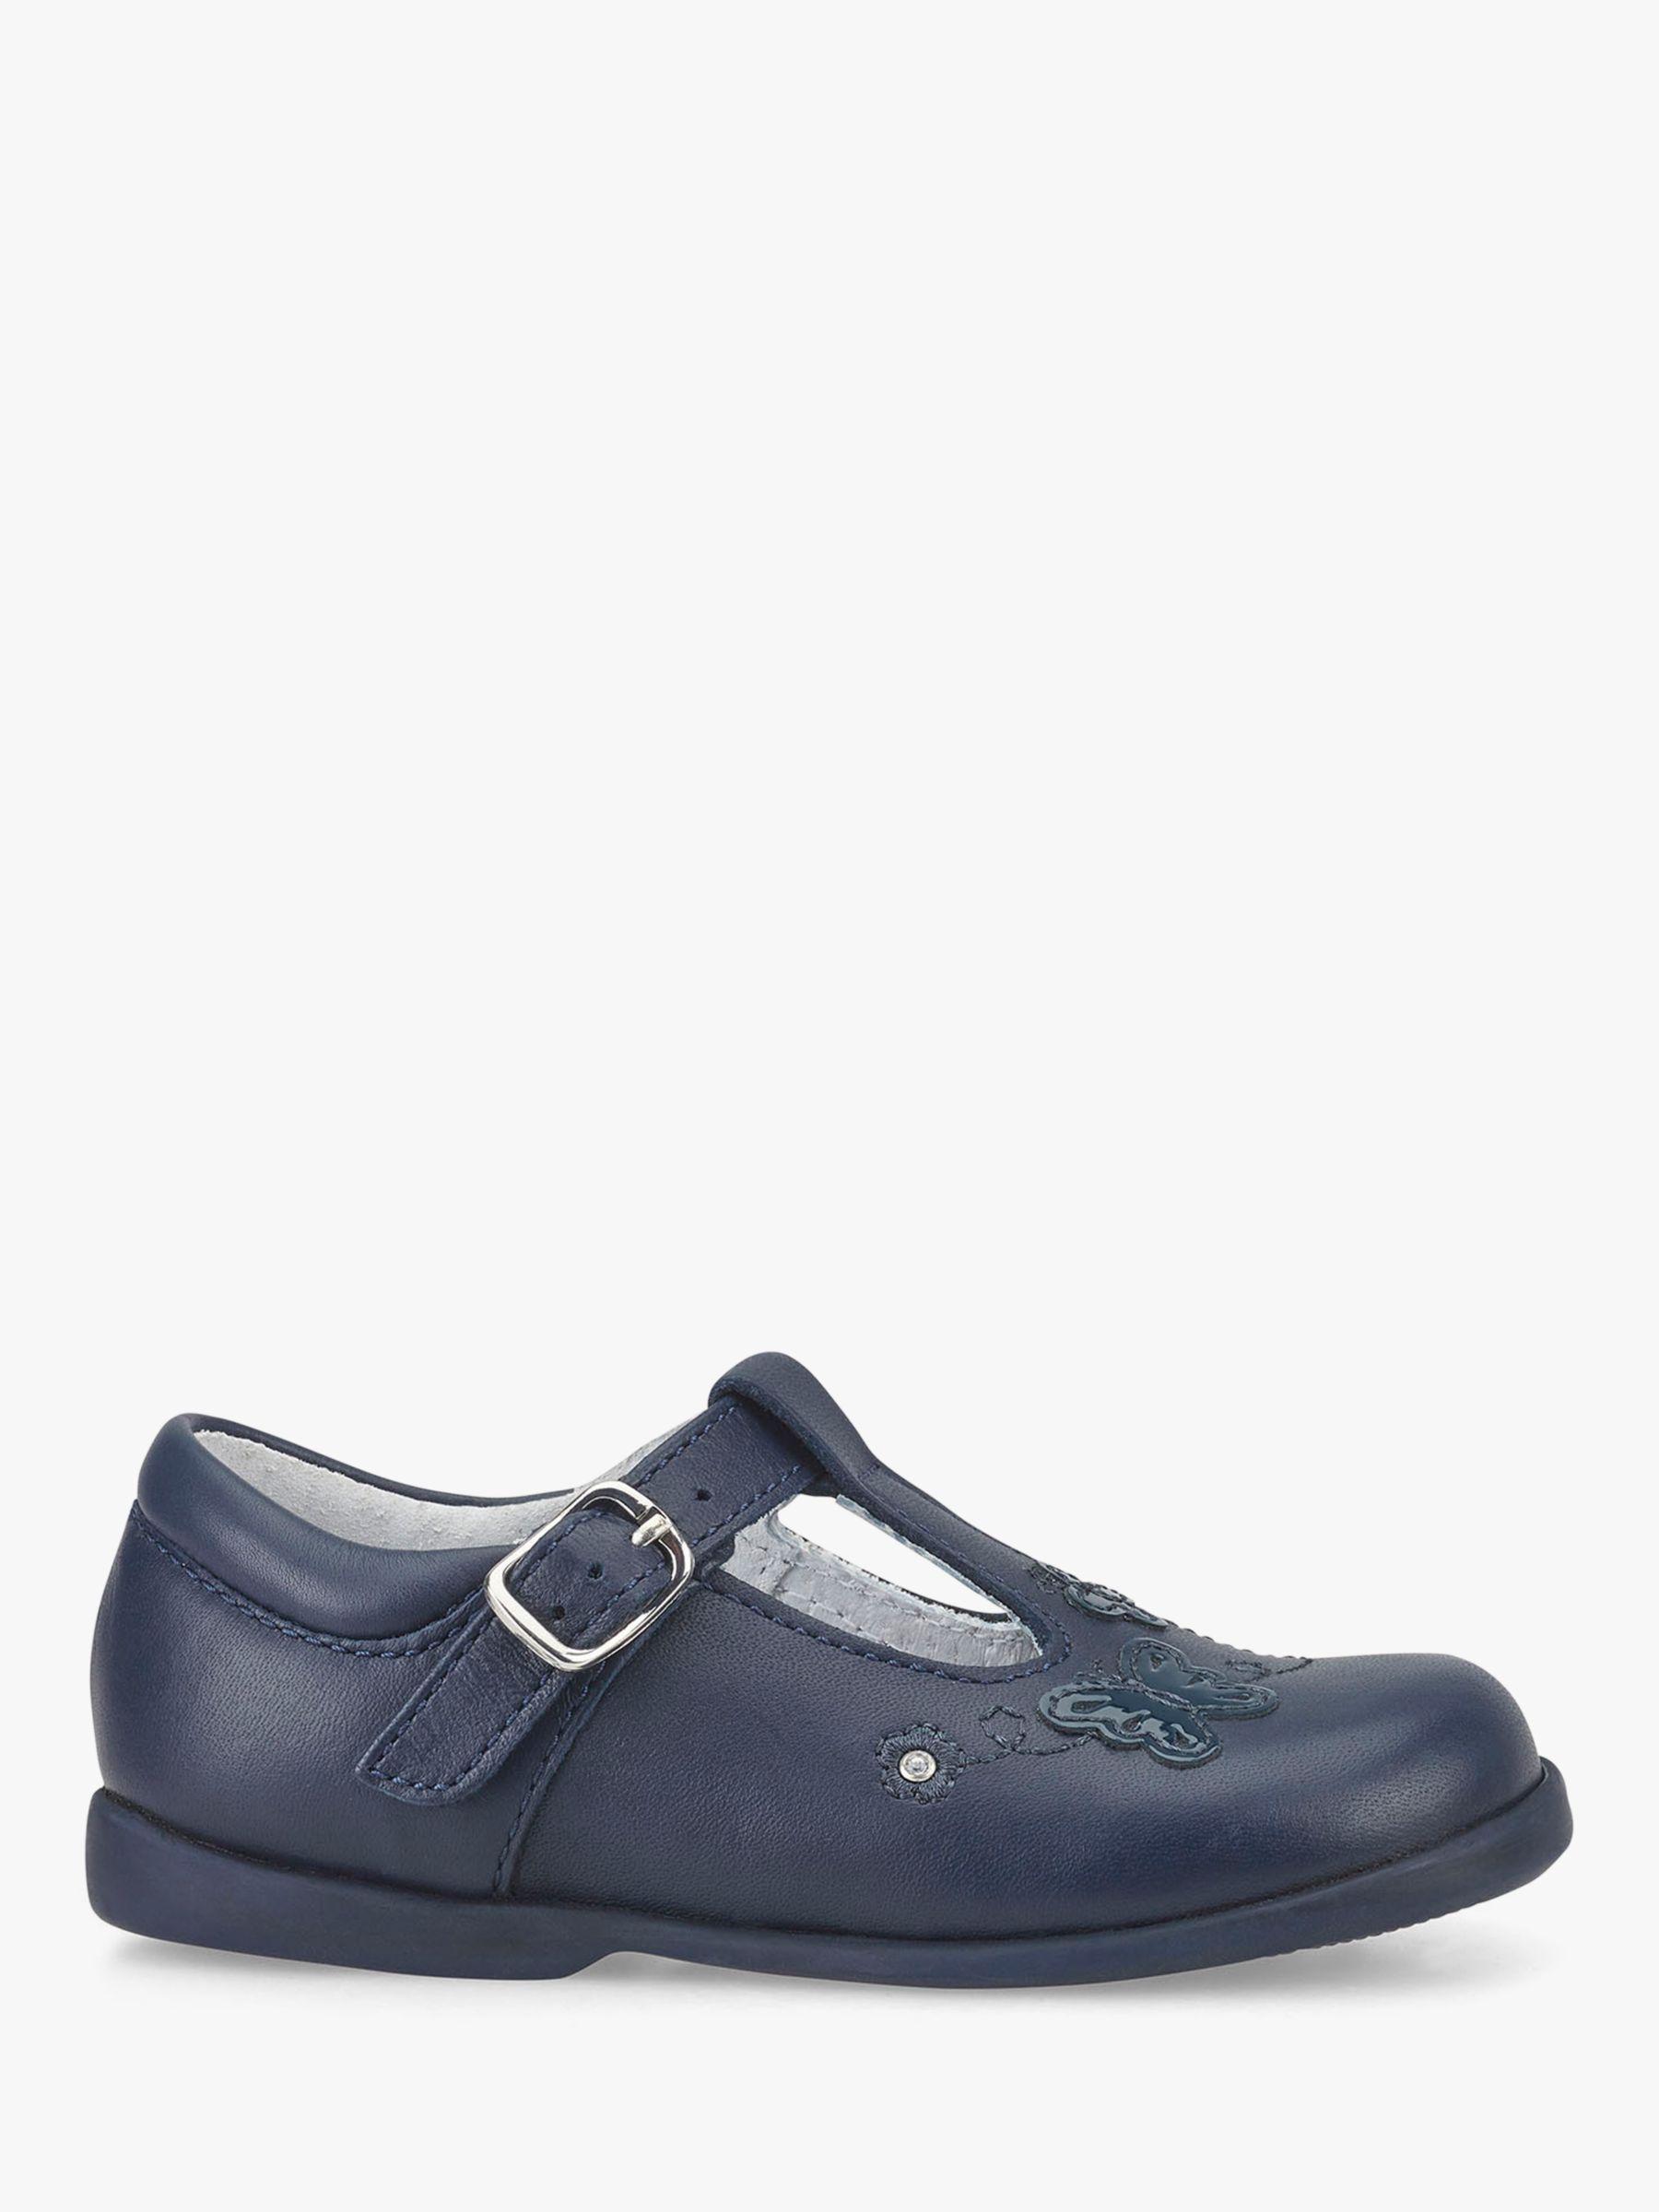 Start-Rite Start-rite Children's Sunshine T-Bar Butterfly Shoes, Navy